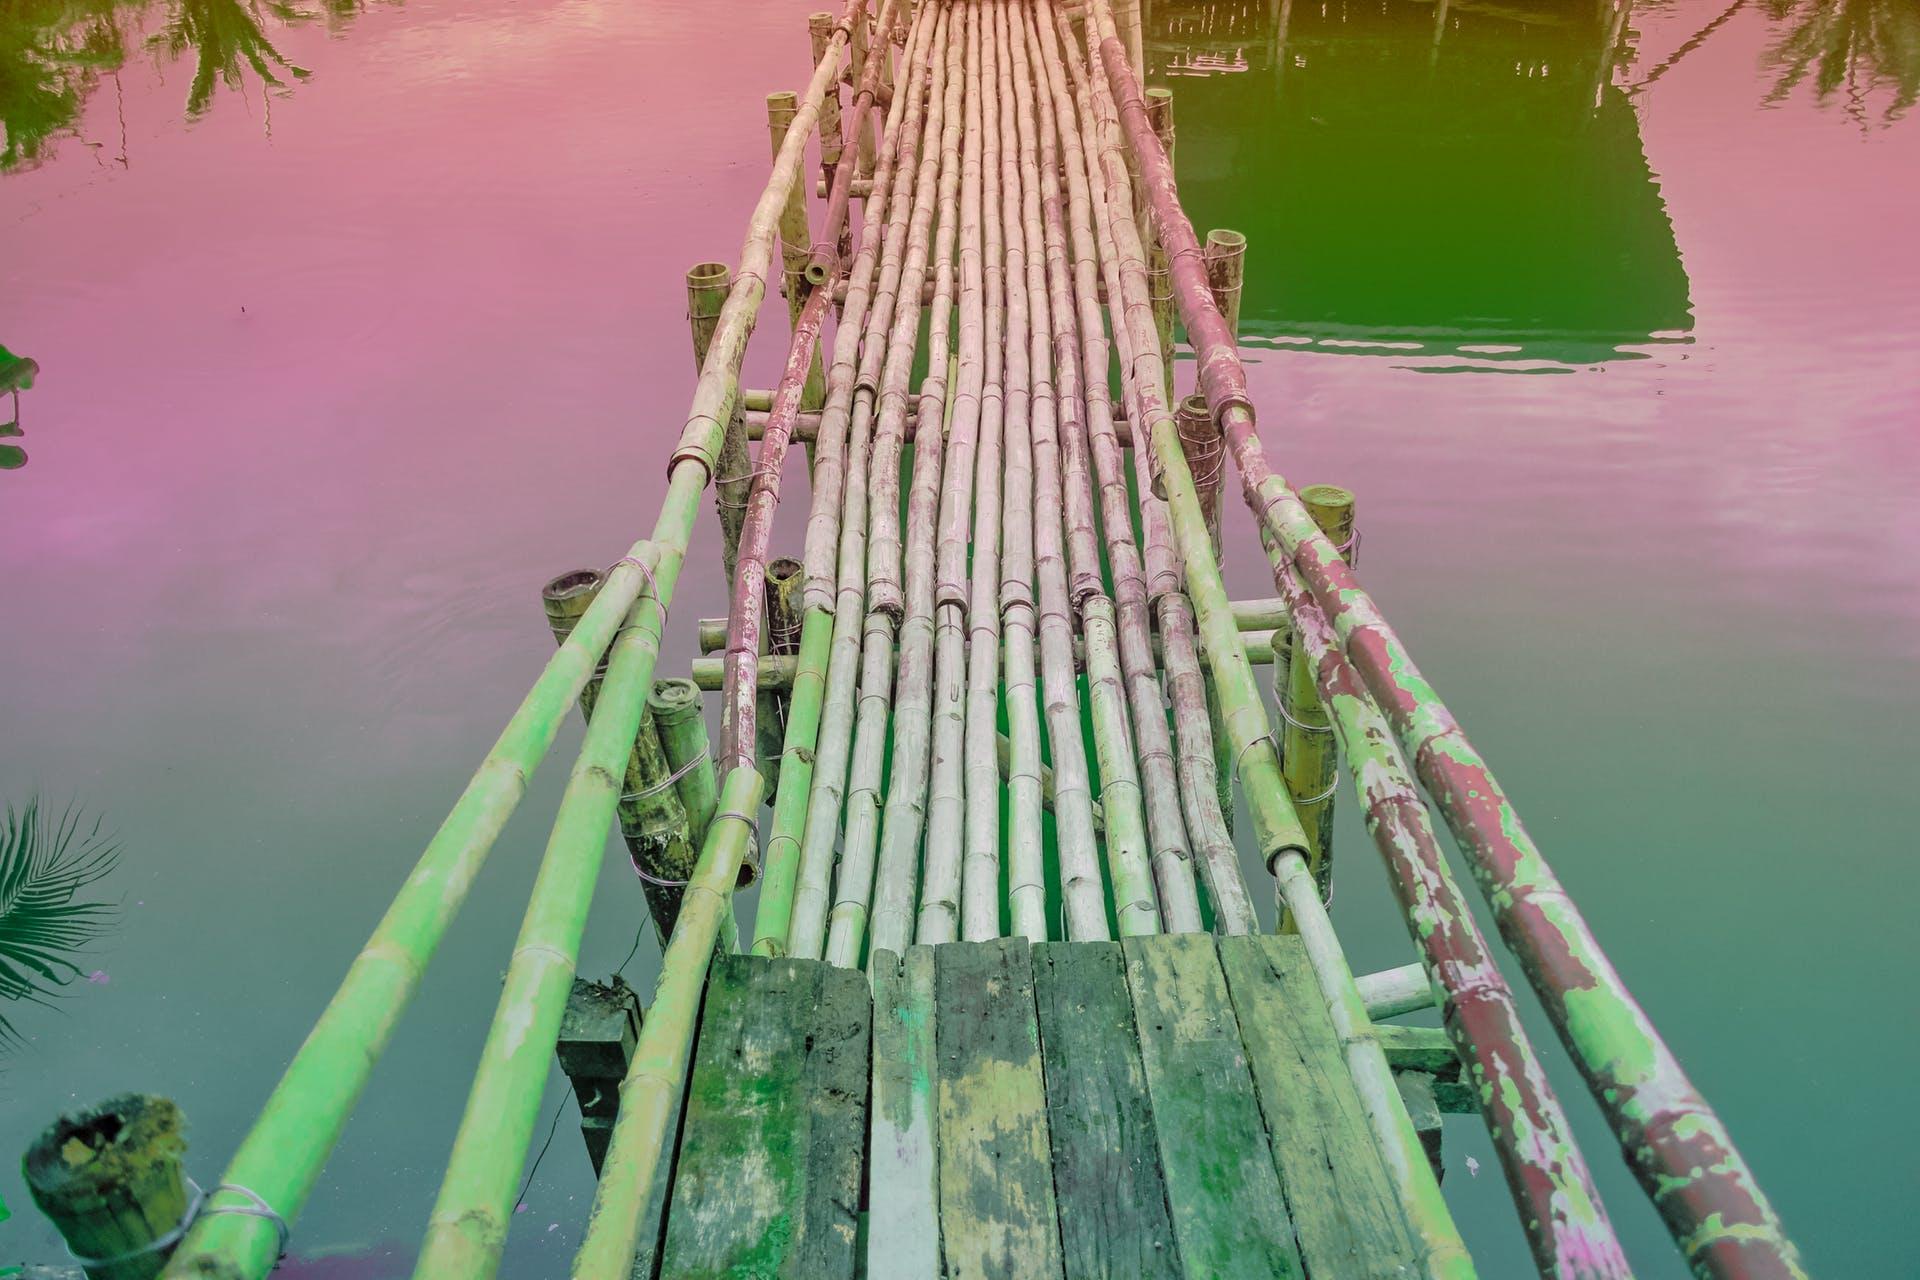 waterscape province edit green outdoorchallenge tropical outdoor bridge